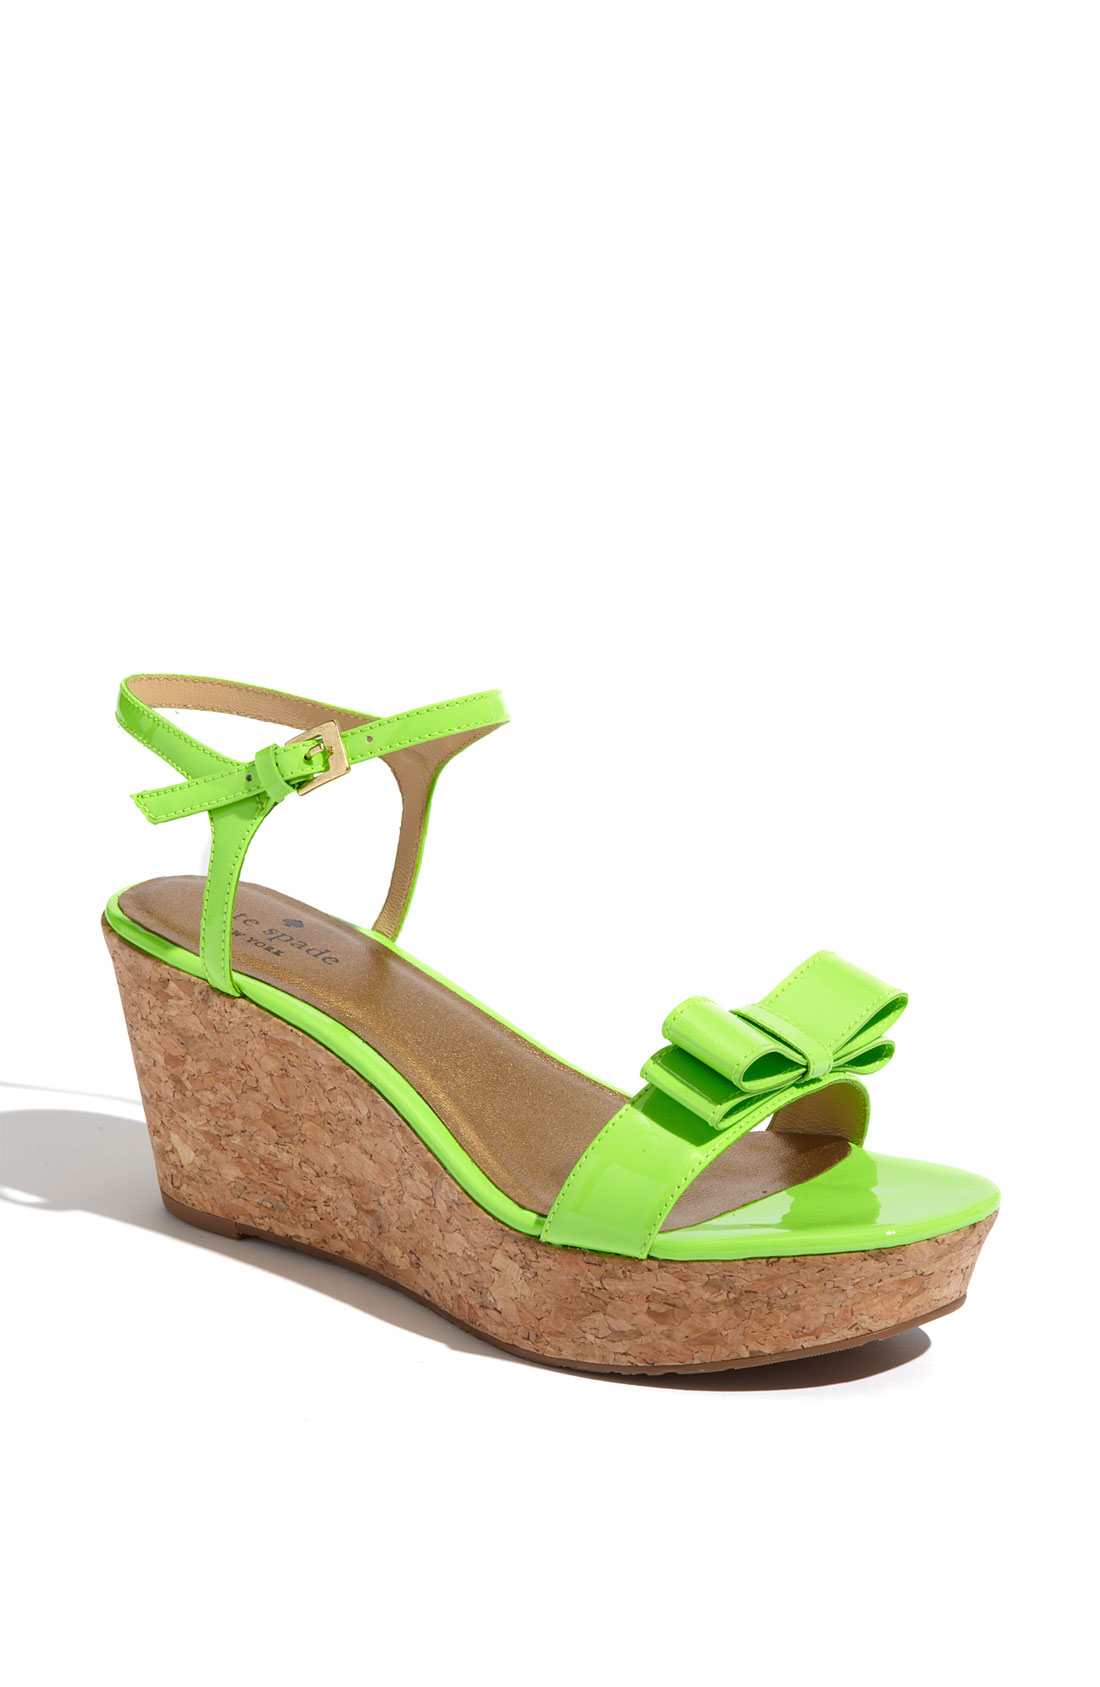 kate spade bandit cork wedge sandal in green lime